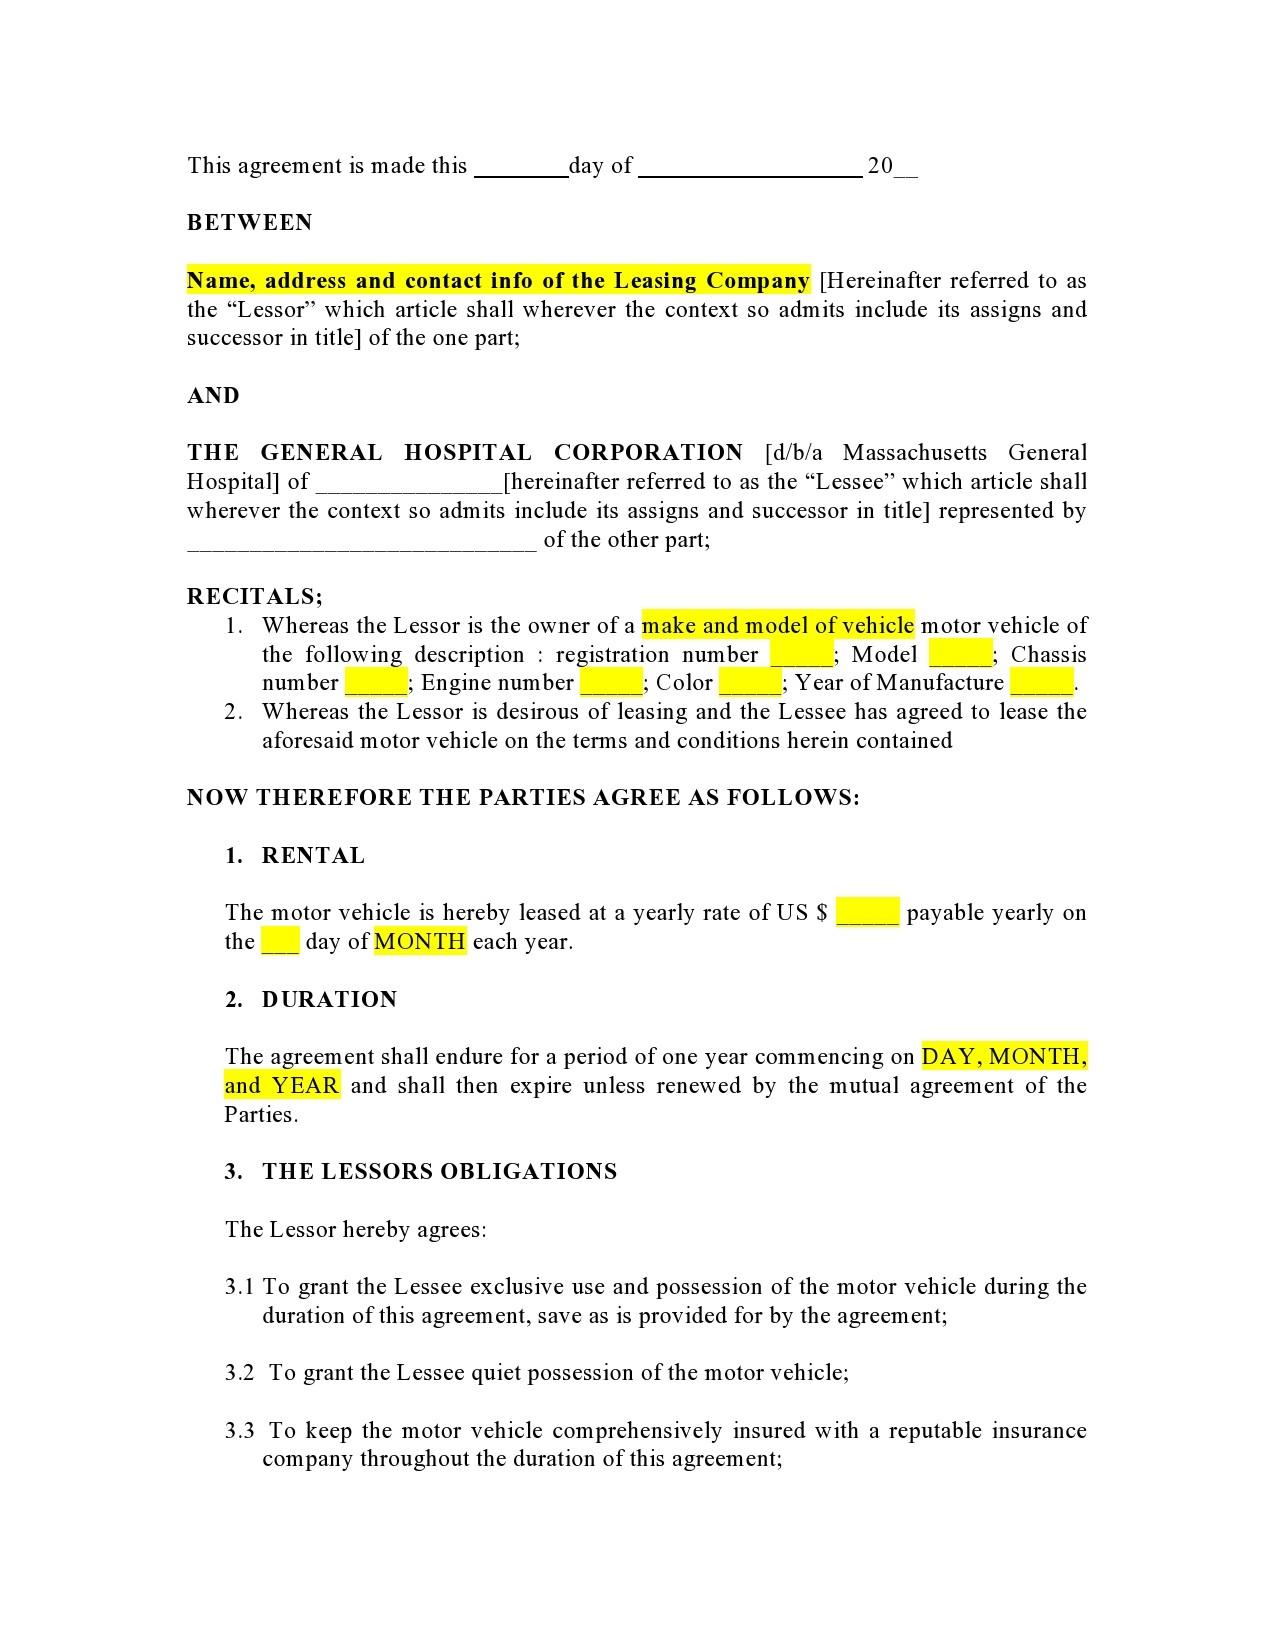 Free car rental agreement 31